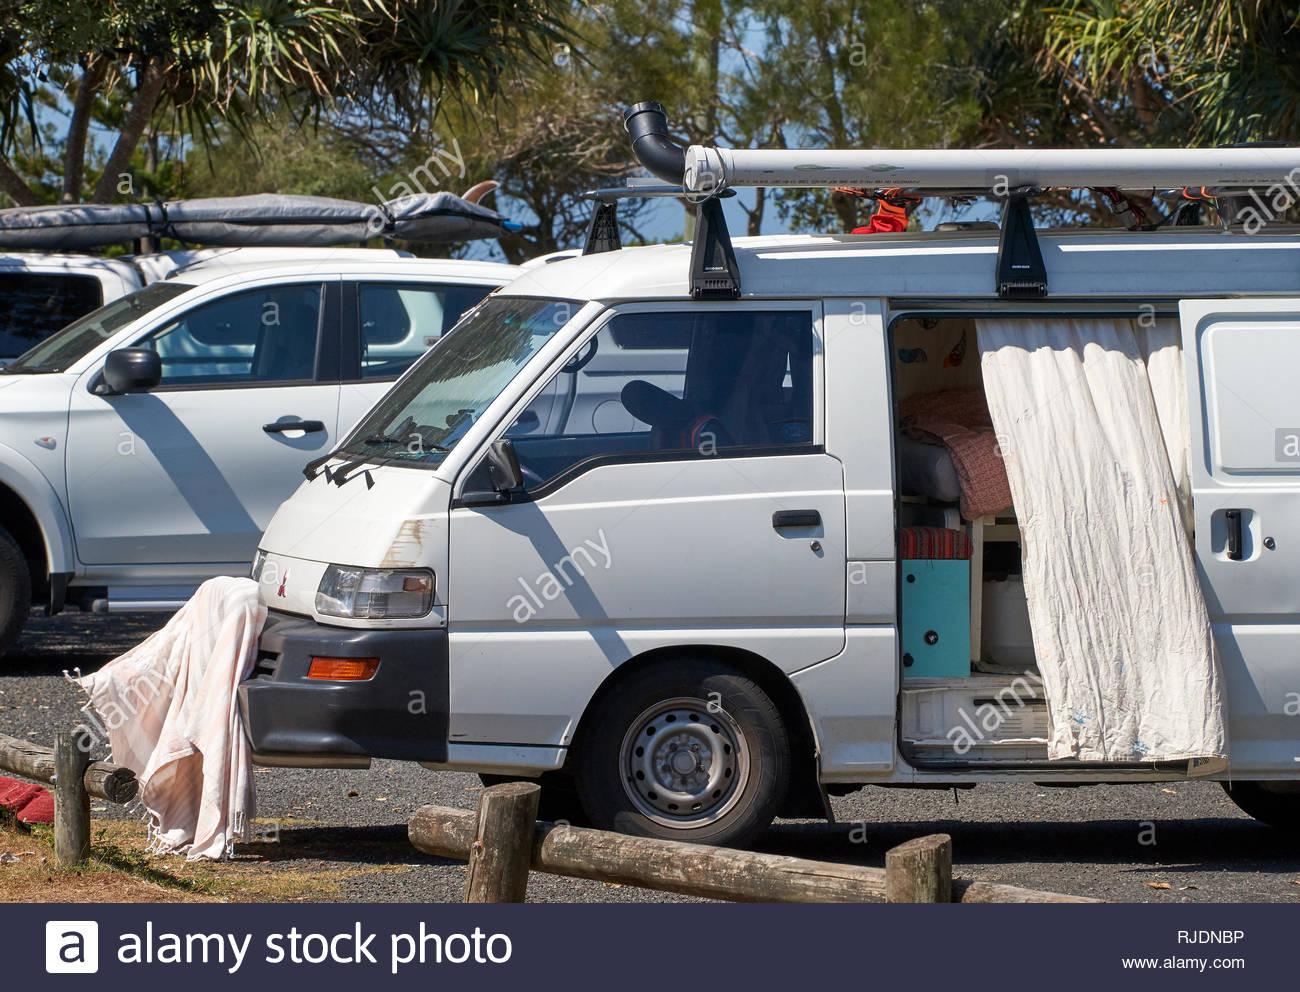 Small Camper Van Stock Photos & Small Camper Van Stock Images - Alamy